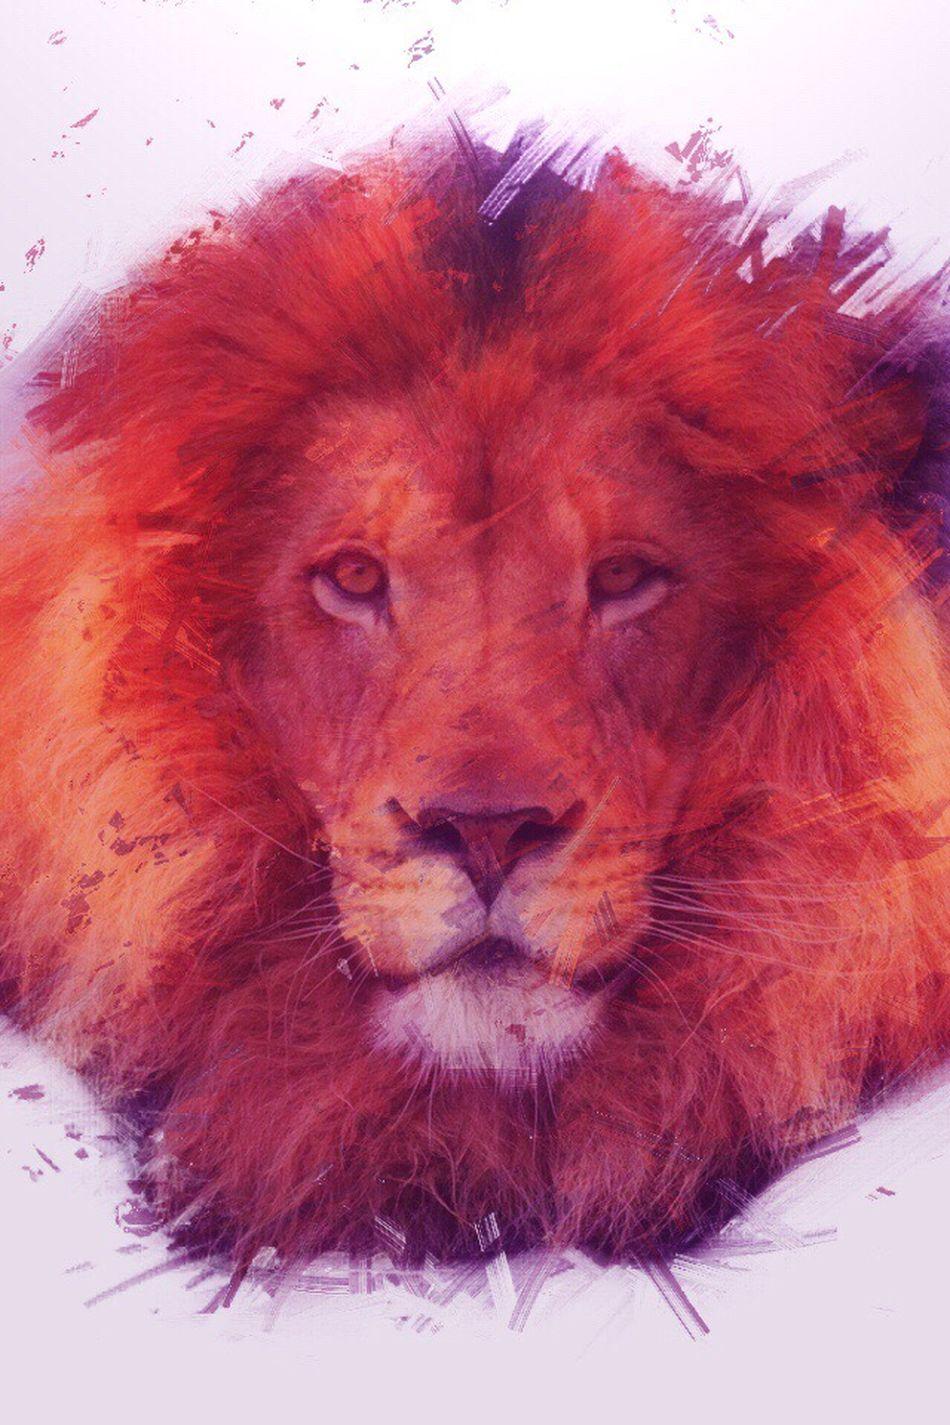 Majestic lion. Wassupworld Messing Around